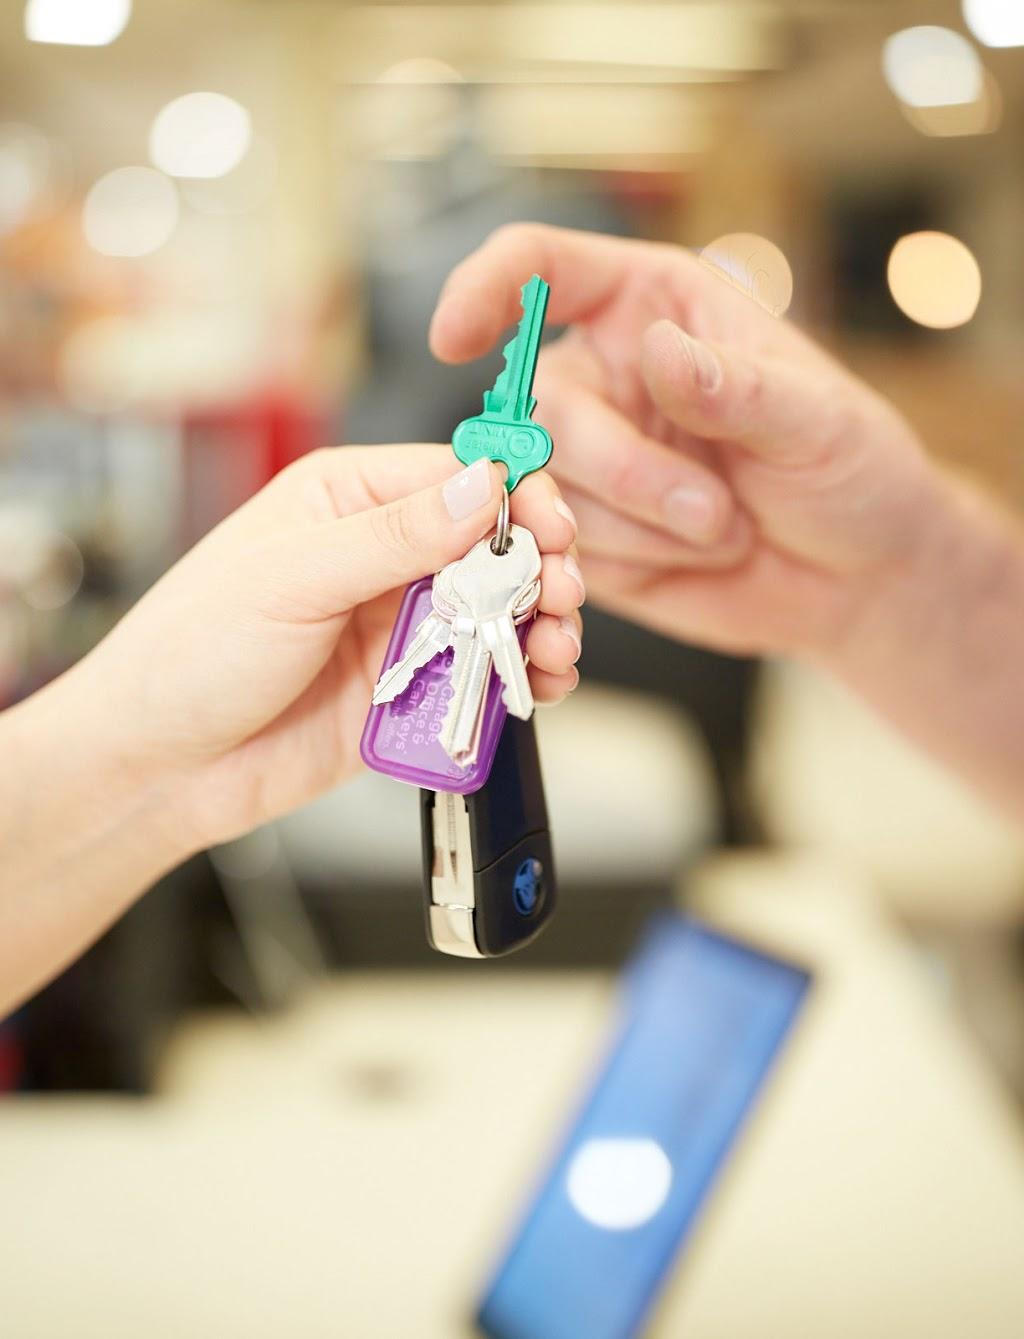 Mister Minit Greensborough Plaza | locksmith | Kiosk 2K9 Greensborough Plaza, 25 Main St, Greensborough VIC 3088, Australia | 0394323152 OR +61 3 9432 3152